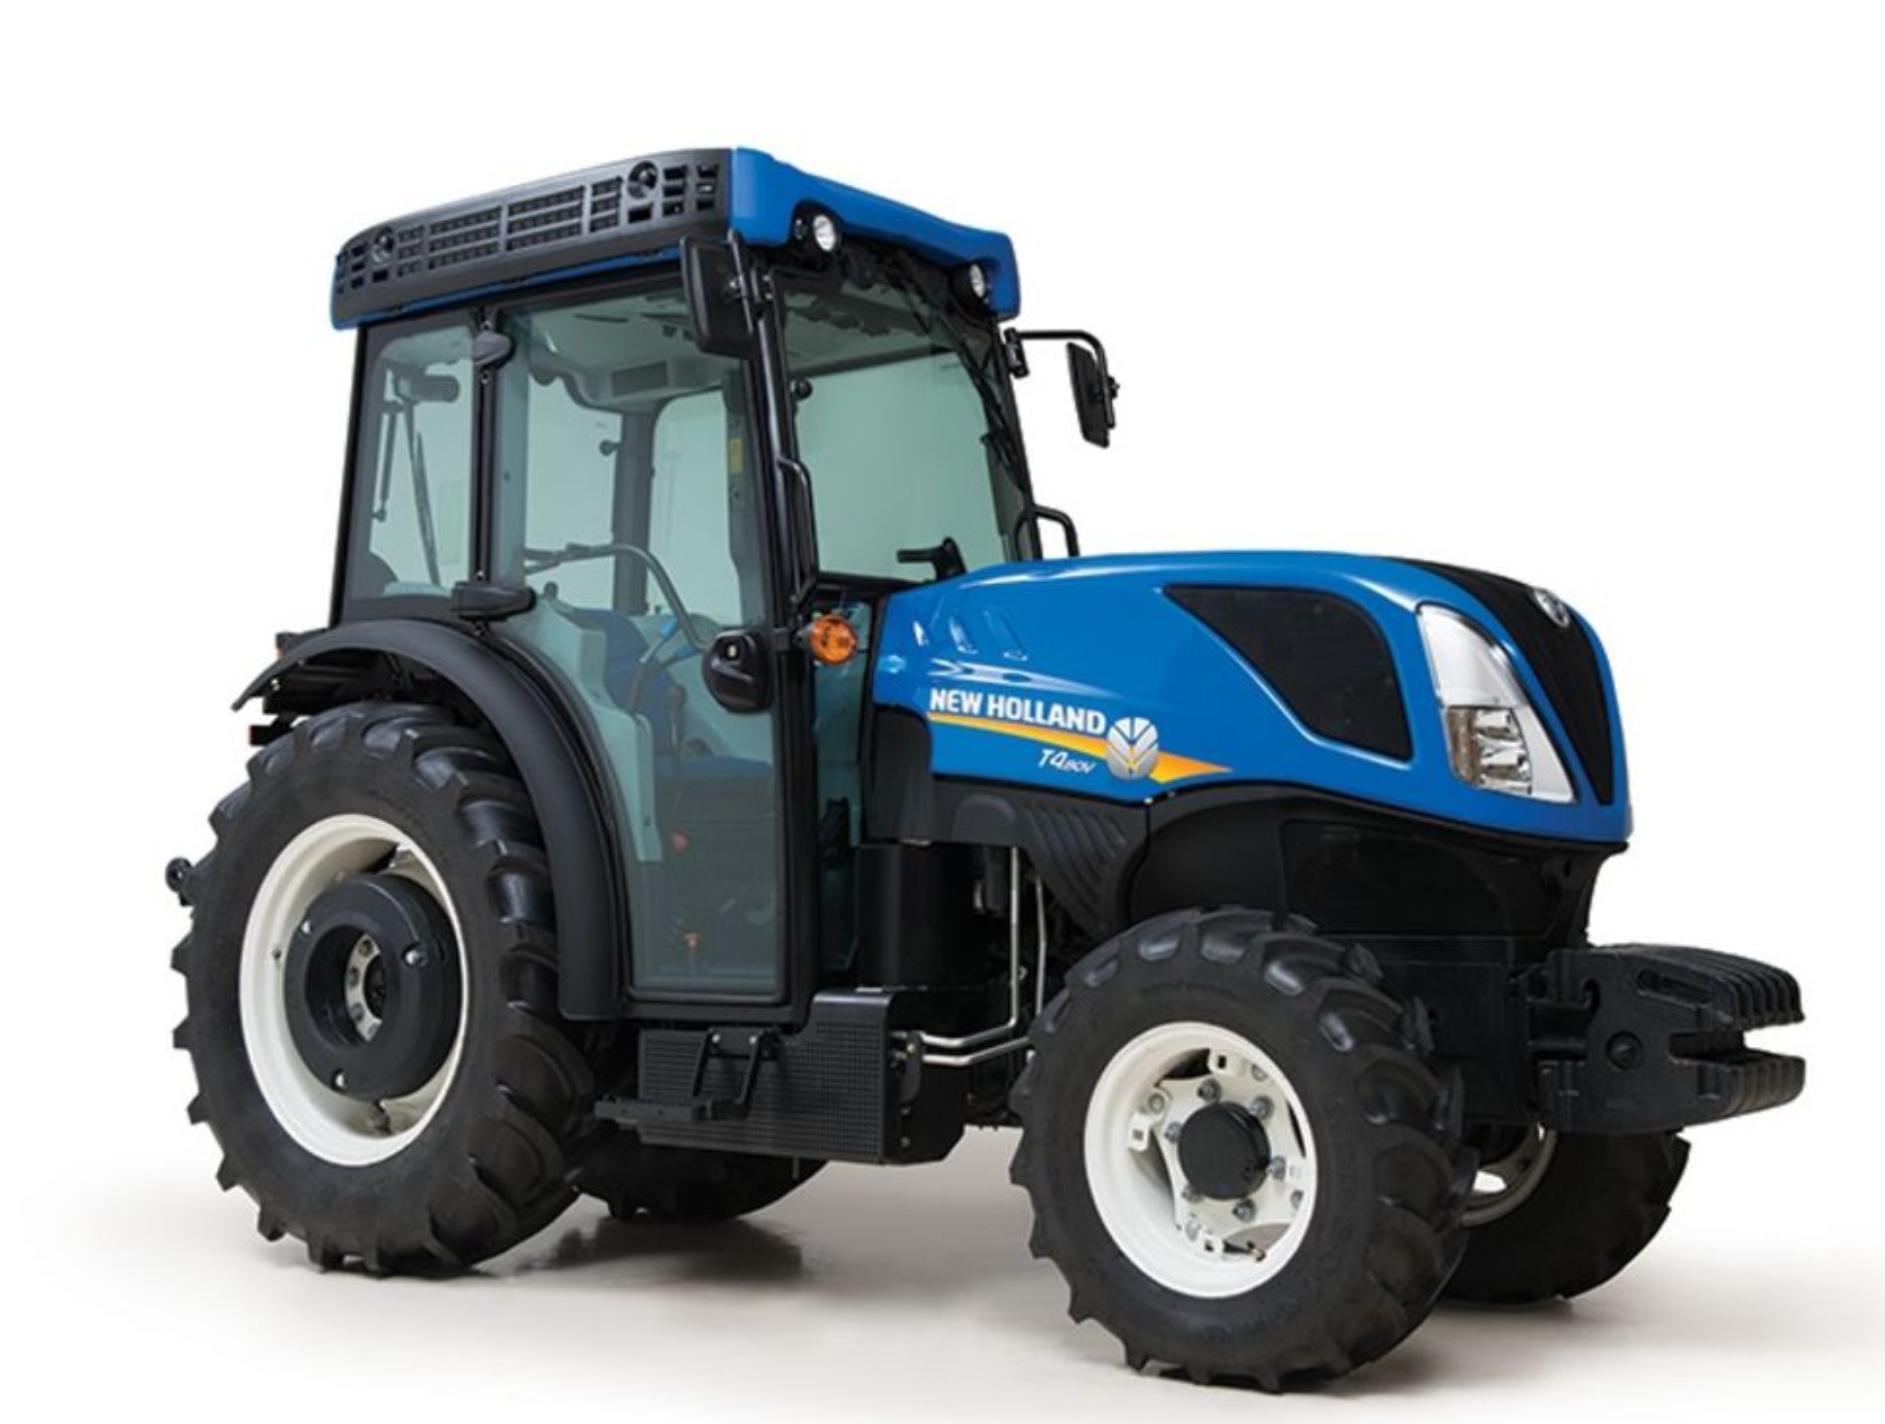 2019-10-01 13_23_04-2017 New Holland T4.80V 15900 _ Klamath Basin Equipment.png